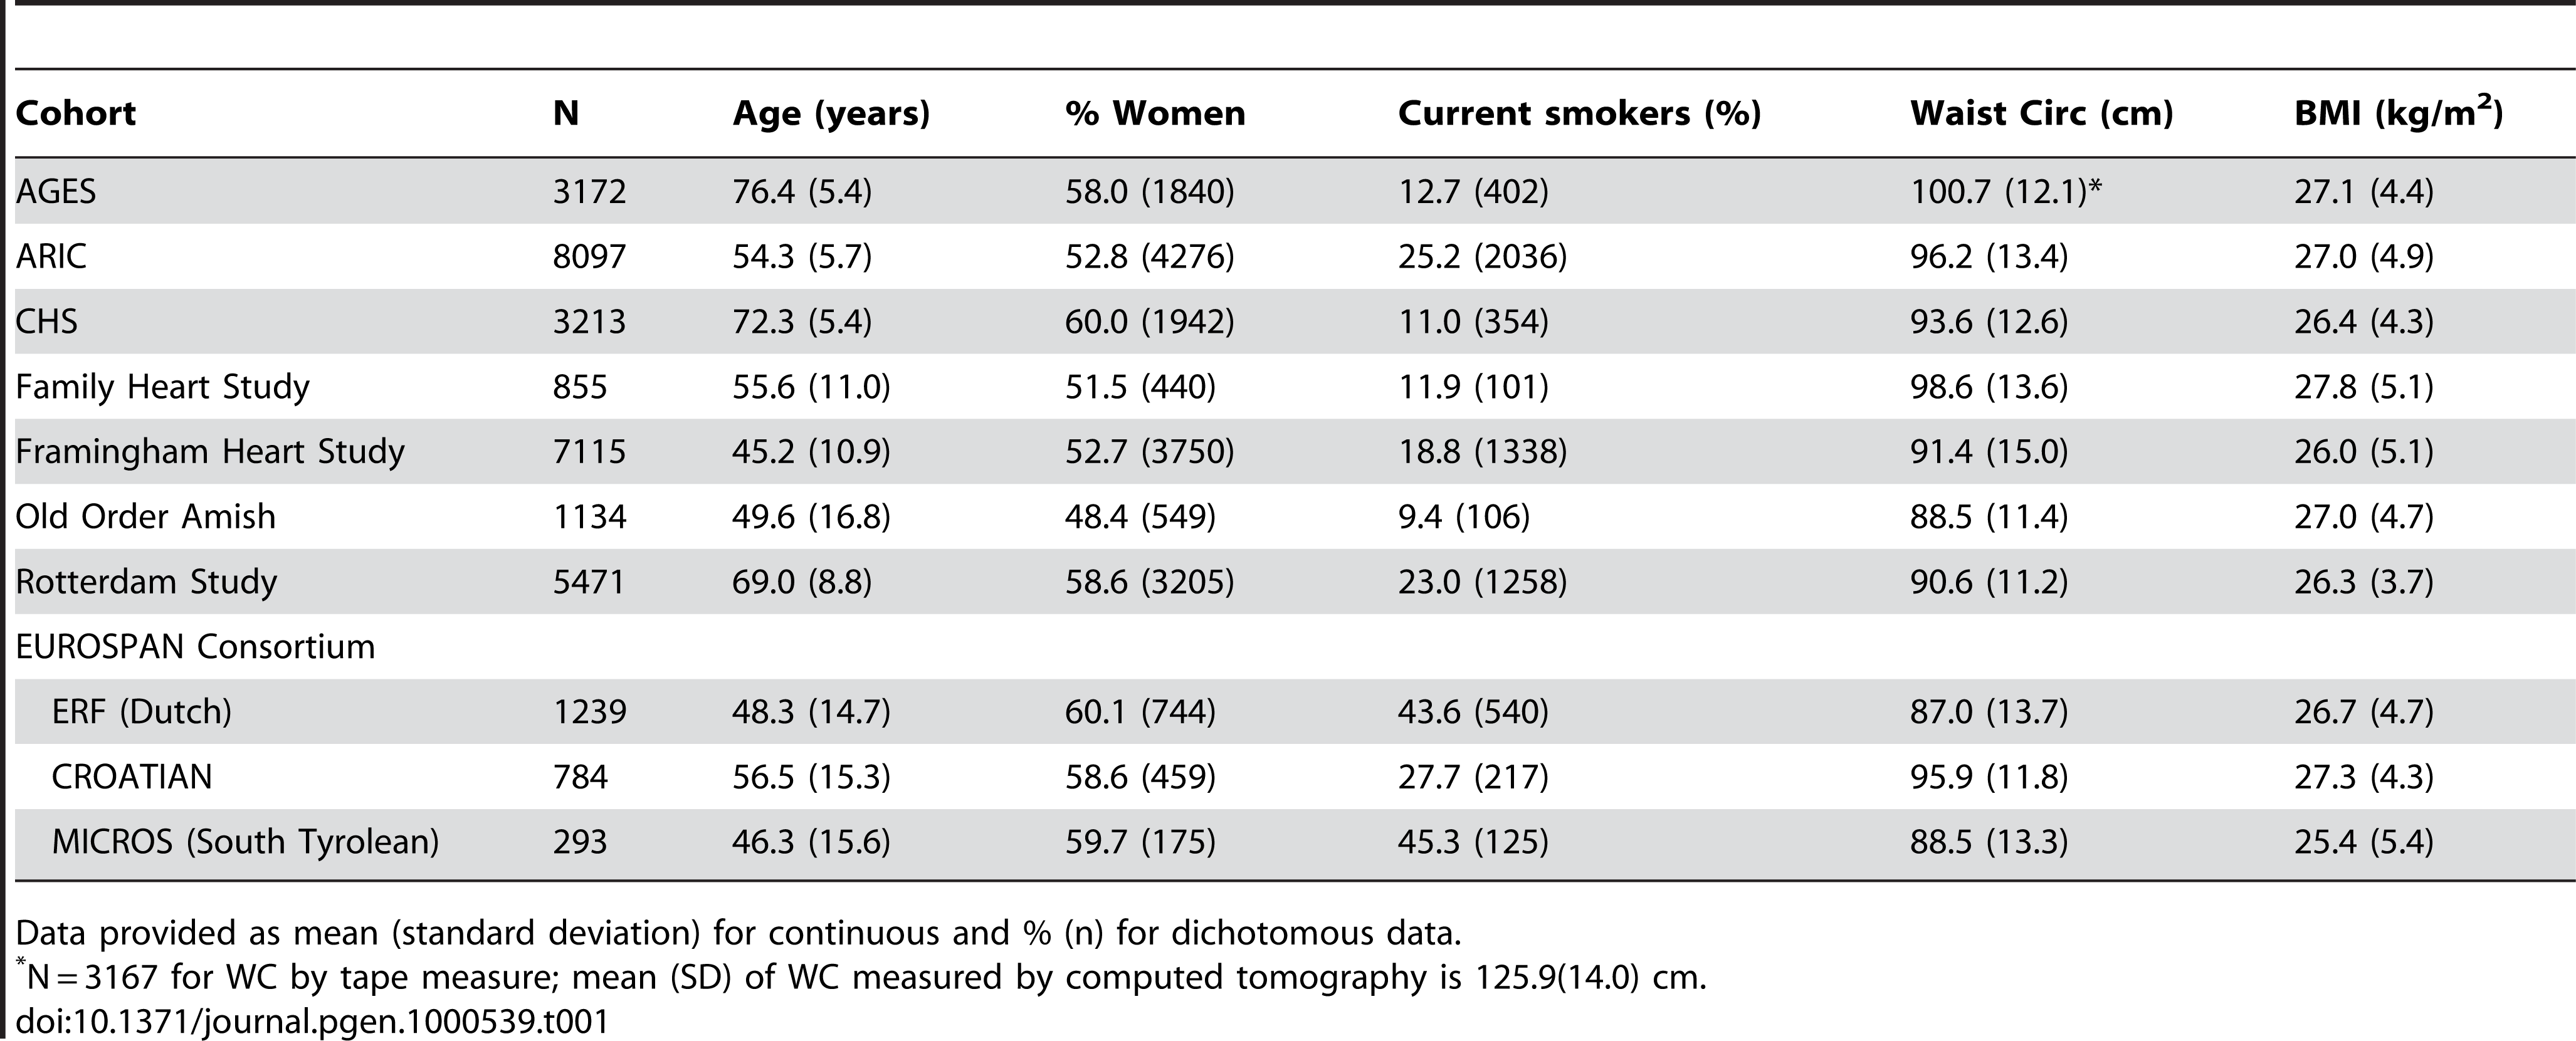 Descriptive statistics across the eight cohorts.